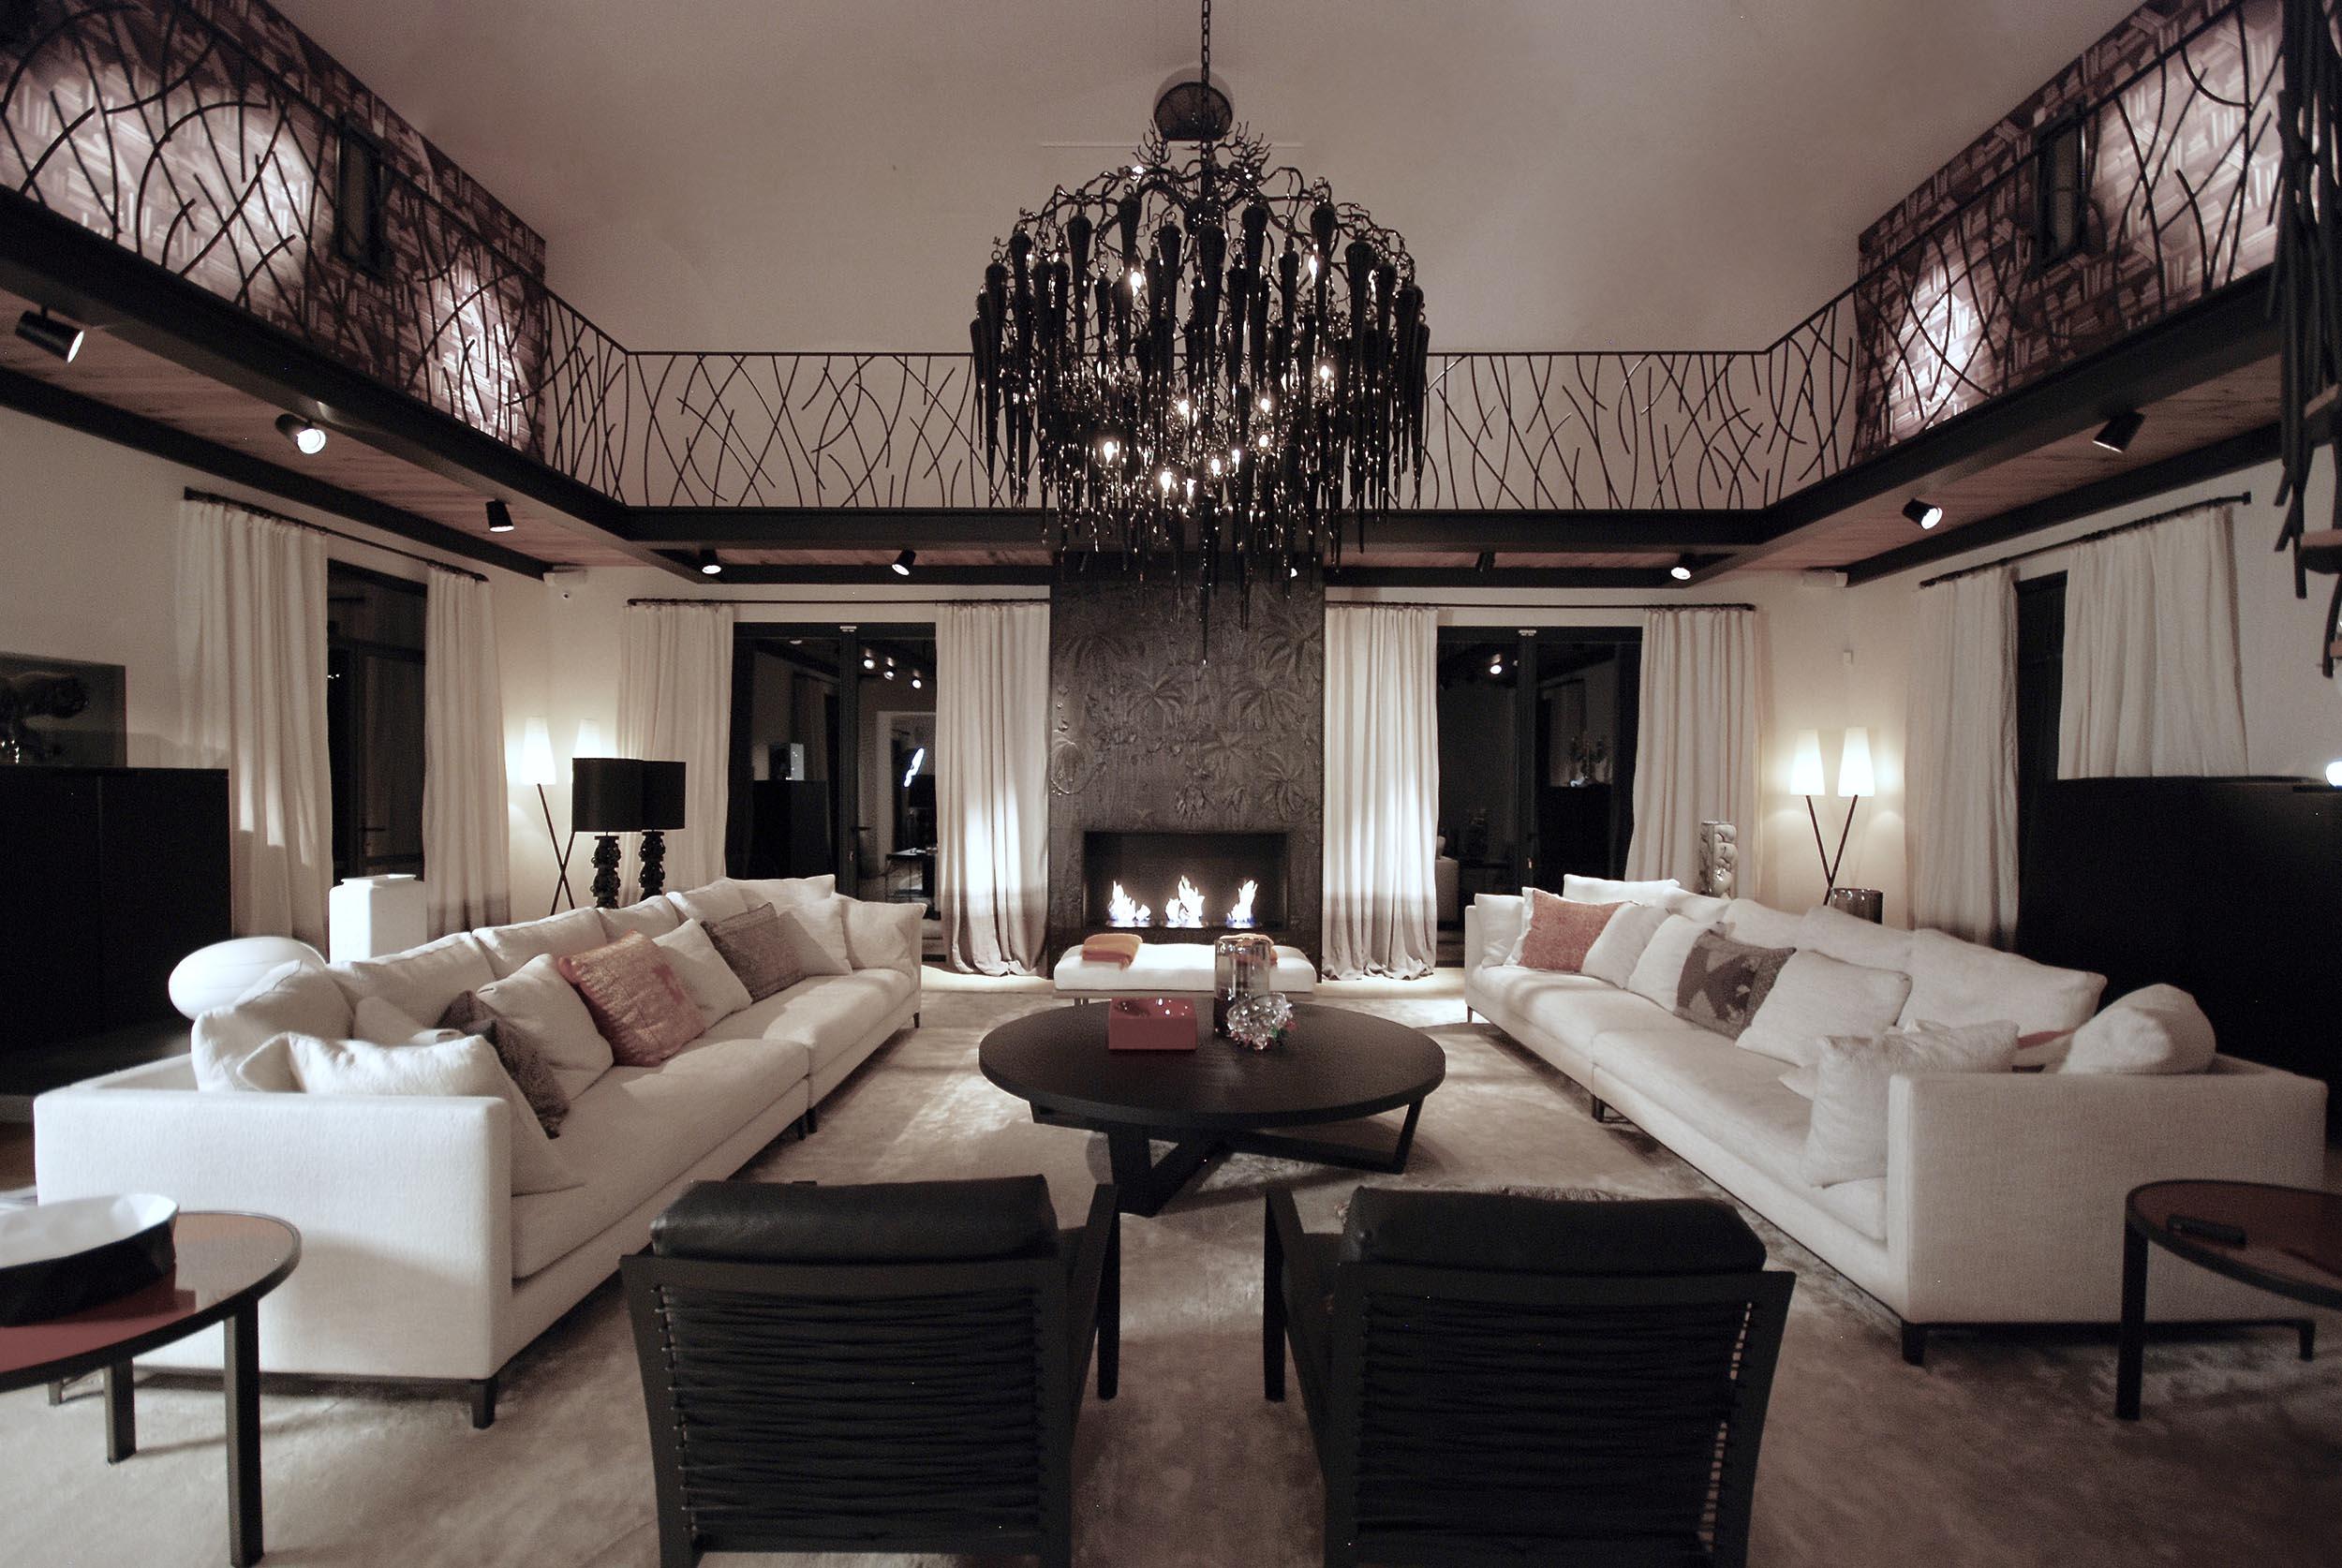 Saint Tropez vardagsrum, Minotti möbler, B&B Italia mböler, Brand Van egmond chandelier, lampor